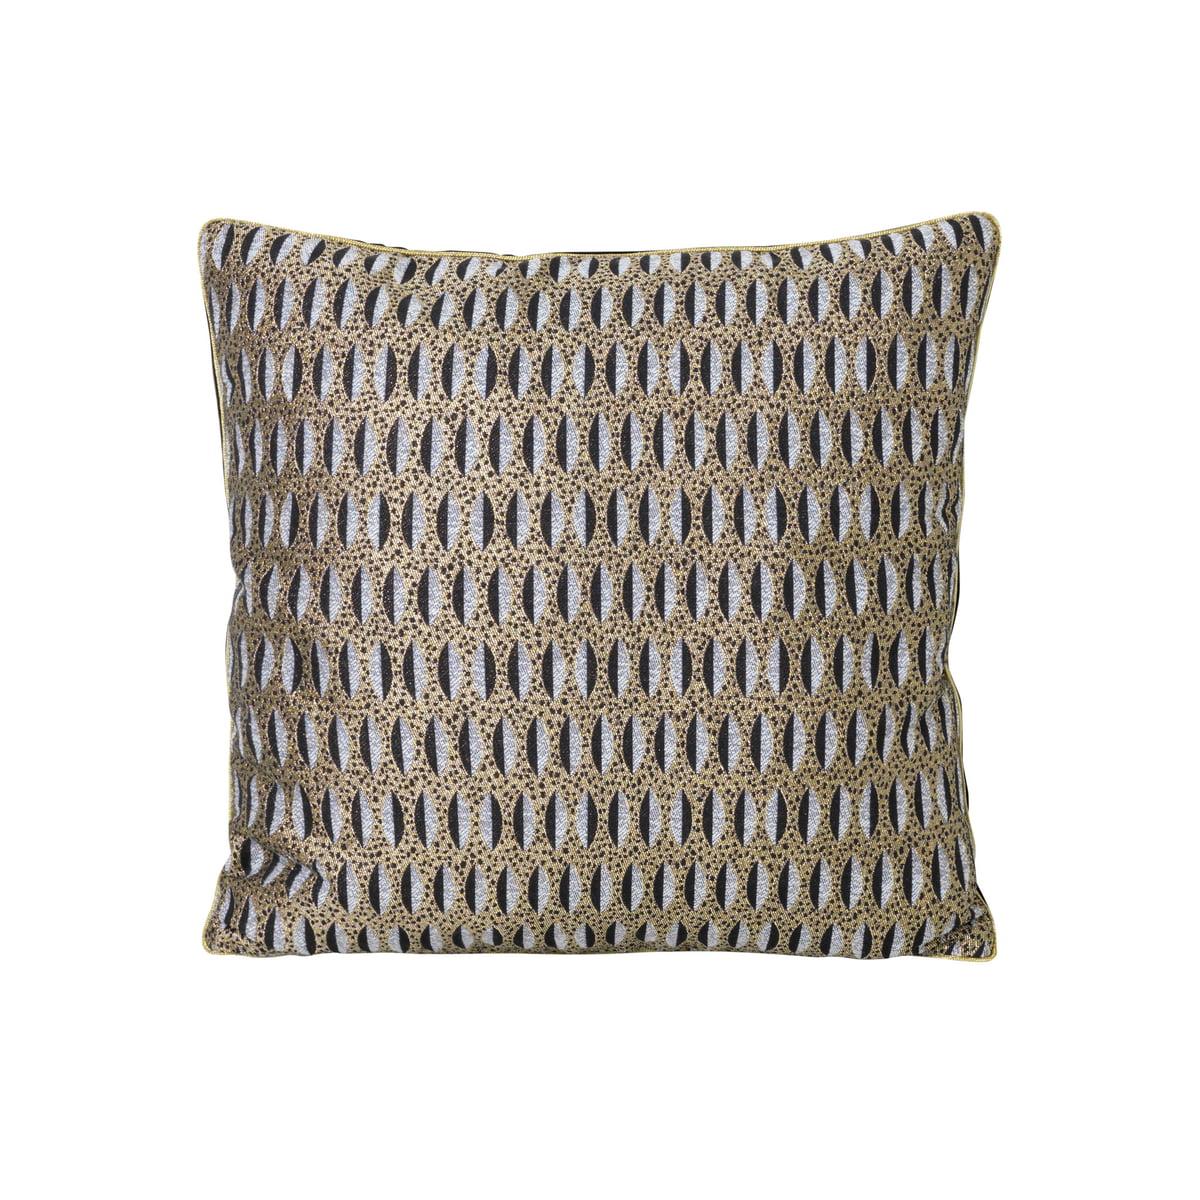 ferm living salon kissen 40 x 40 cm leaf mehrfarbig t 40 h 25 b 40 online kaufen bei woonio. Black Bedroom Furniture Sets. Home Design Ideas